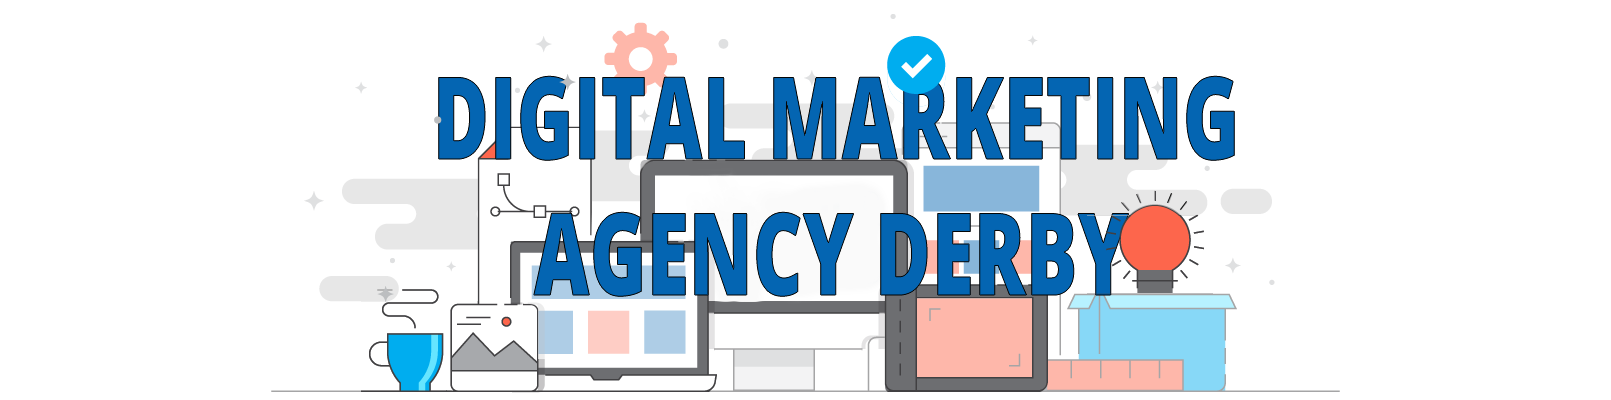 top digital marketing agency in Derby